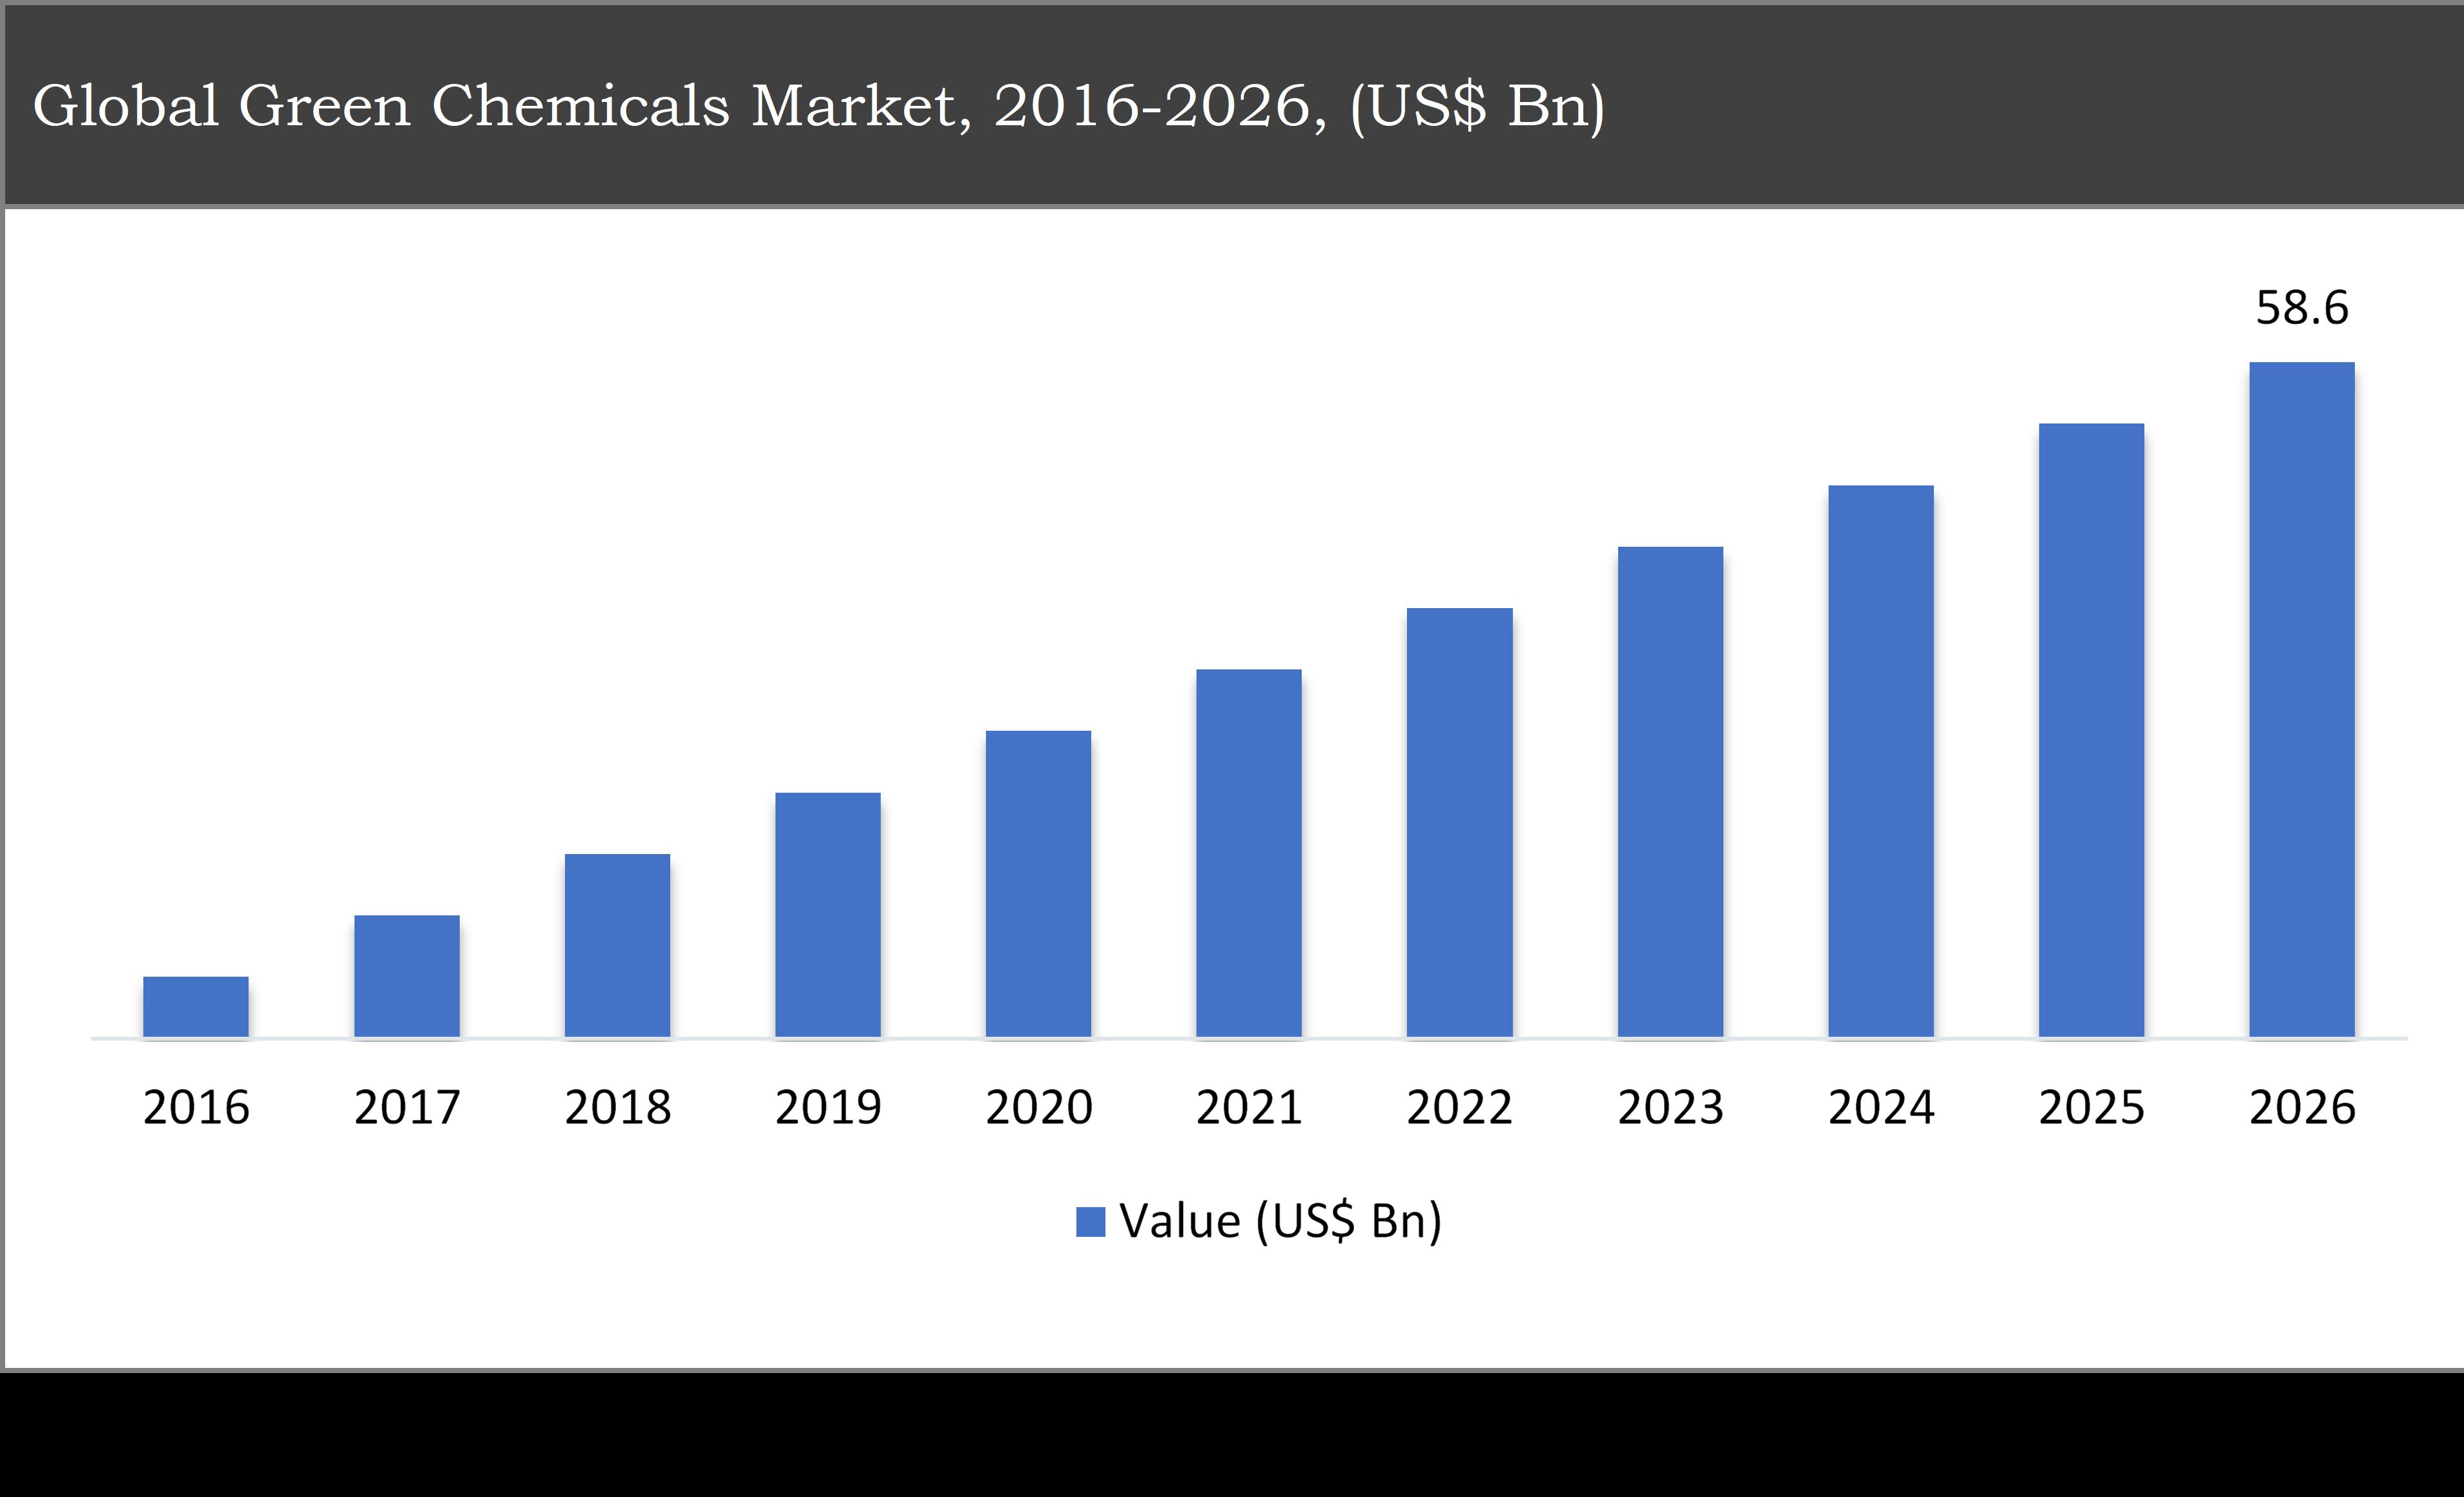 Global Green Chemicals Market, 2016-2026